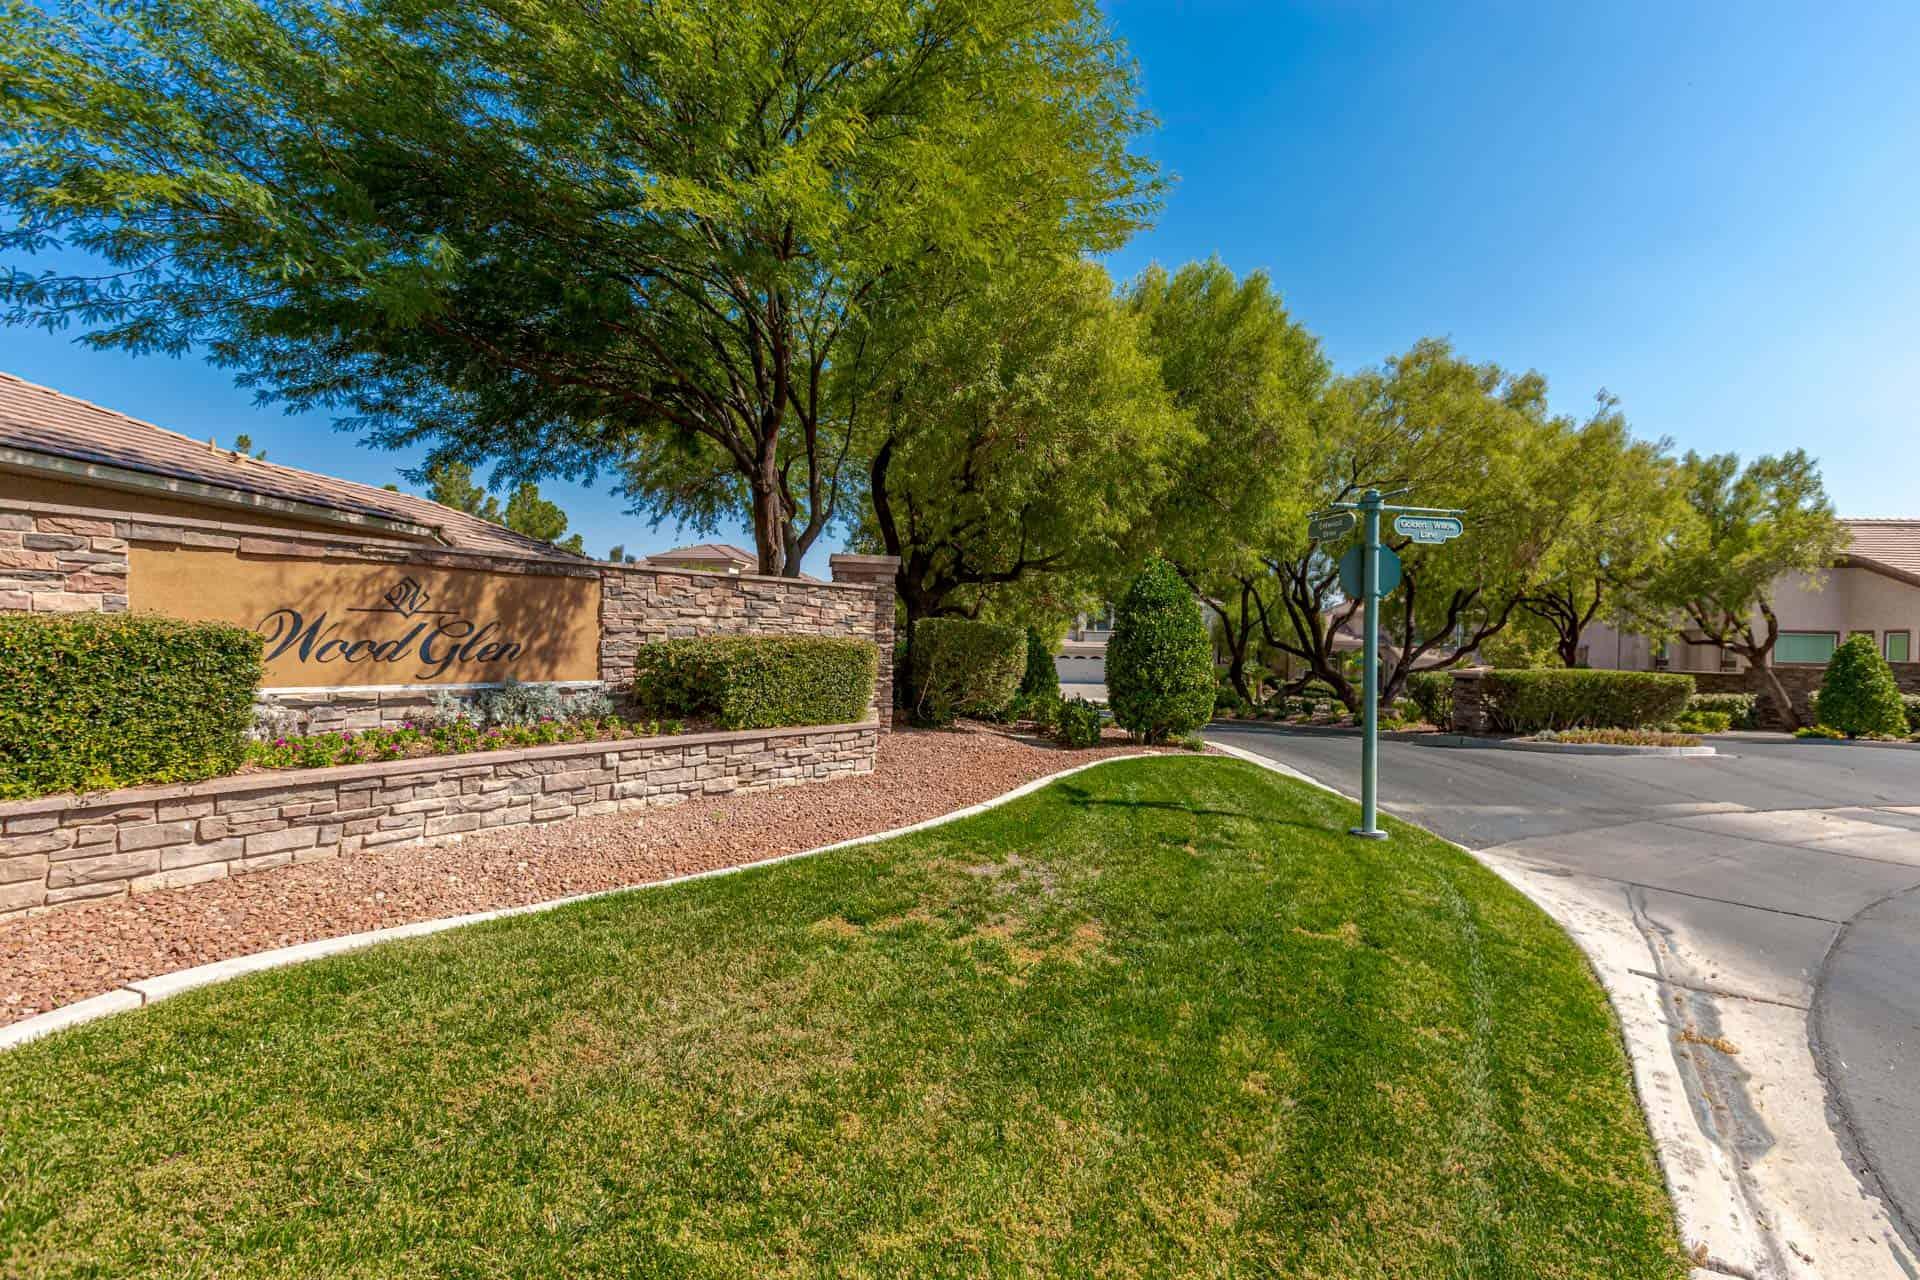 las-vegas-luxry-real-estate-realtor-rob-jensen-company-10729-grey-havens-court-willow-creek5765